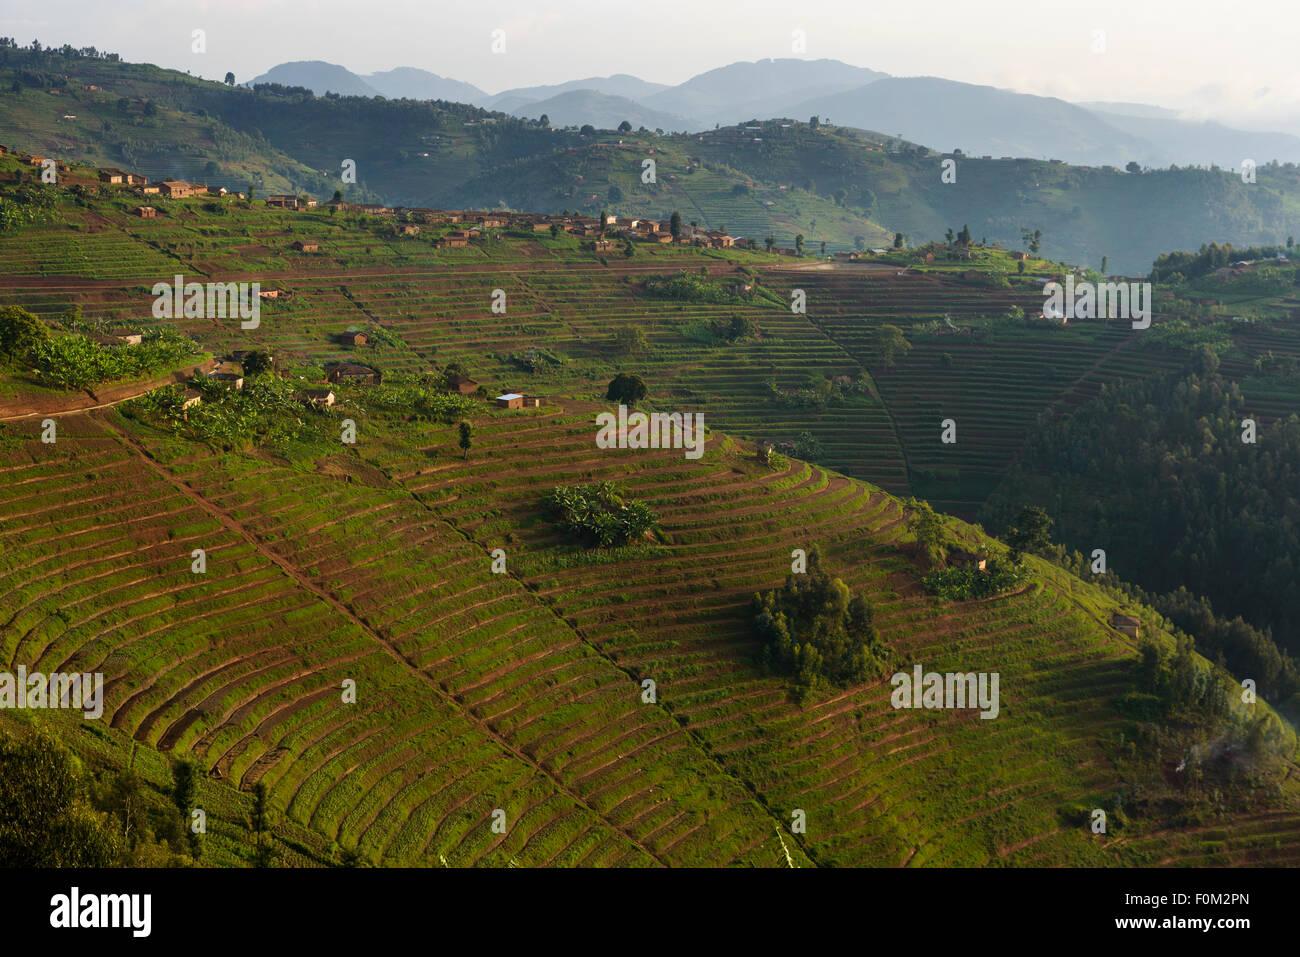 Mountains of western Rwanda, Africa - Stock Image